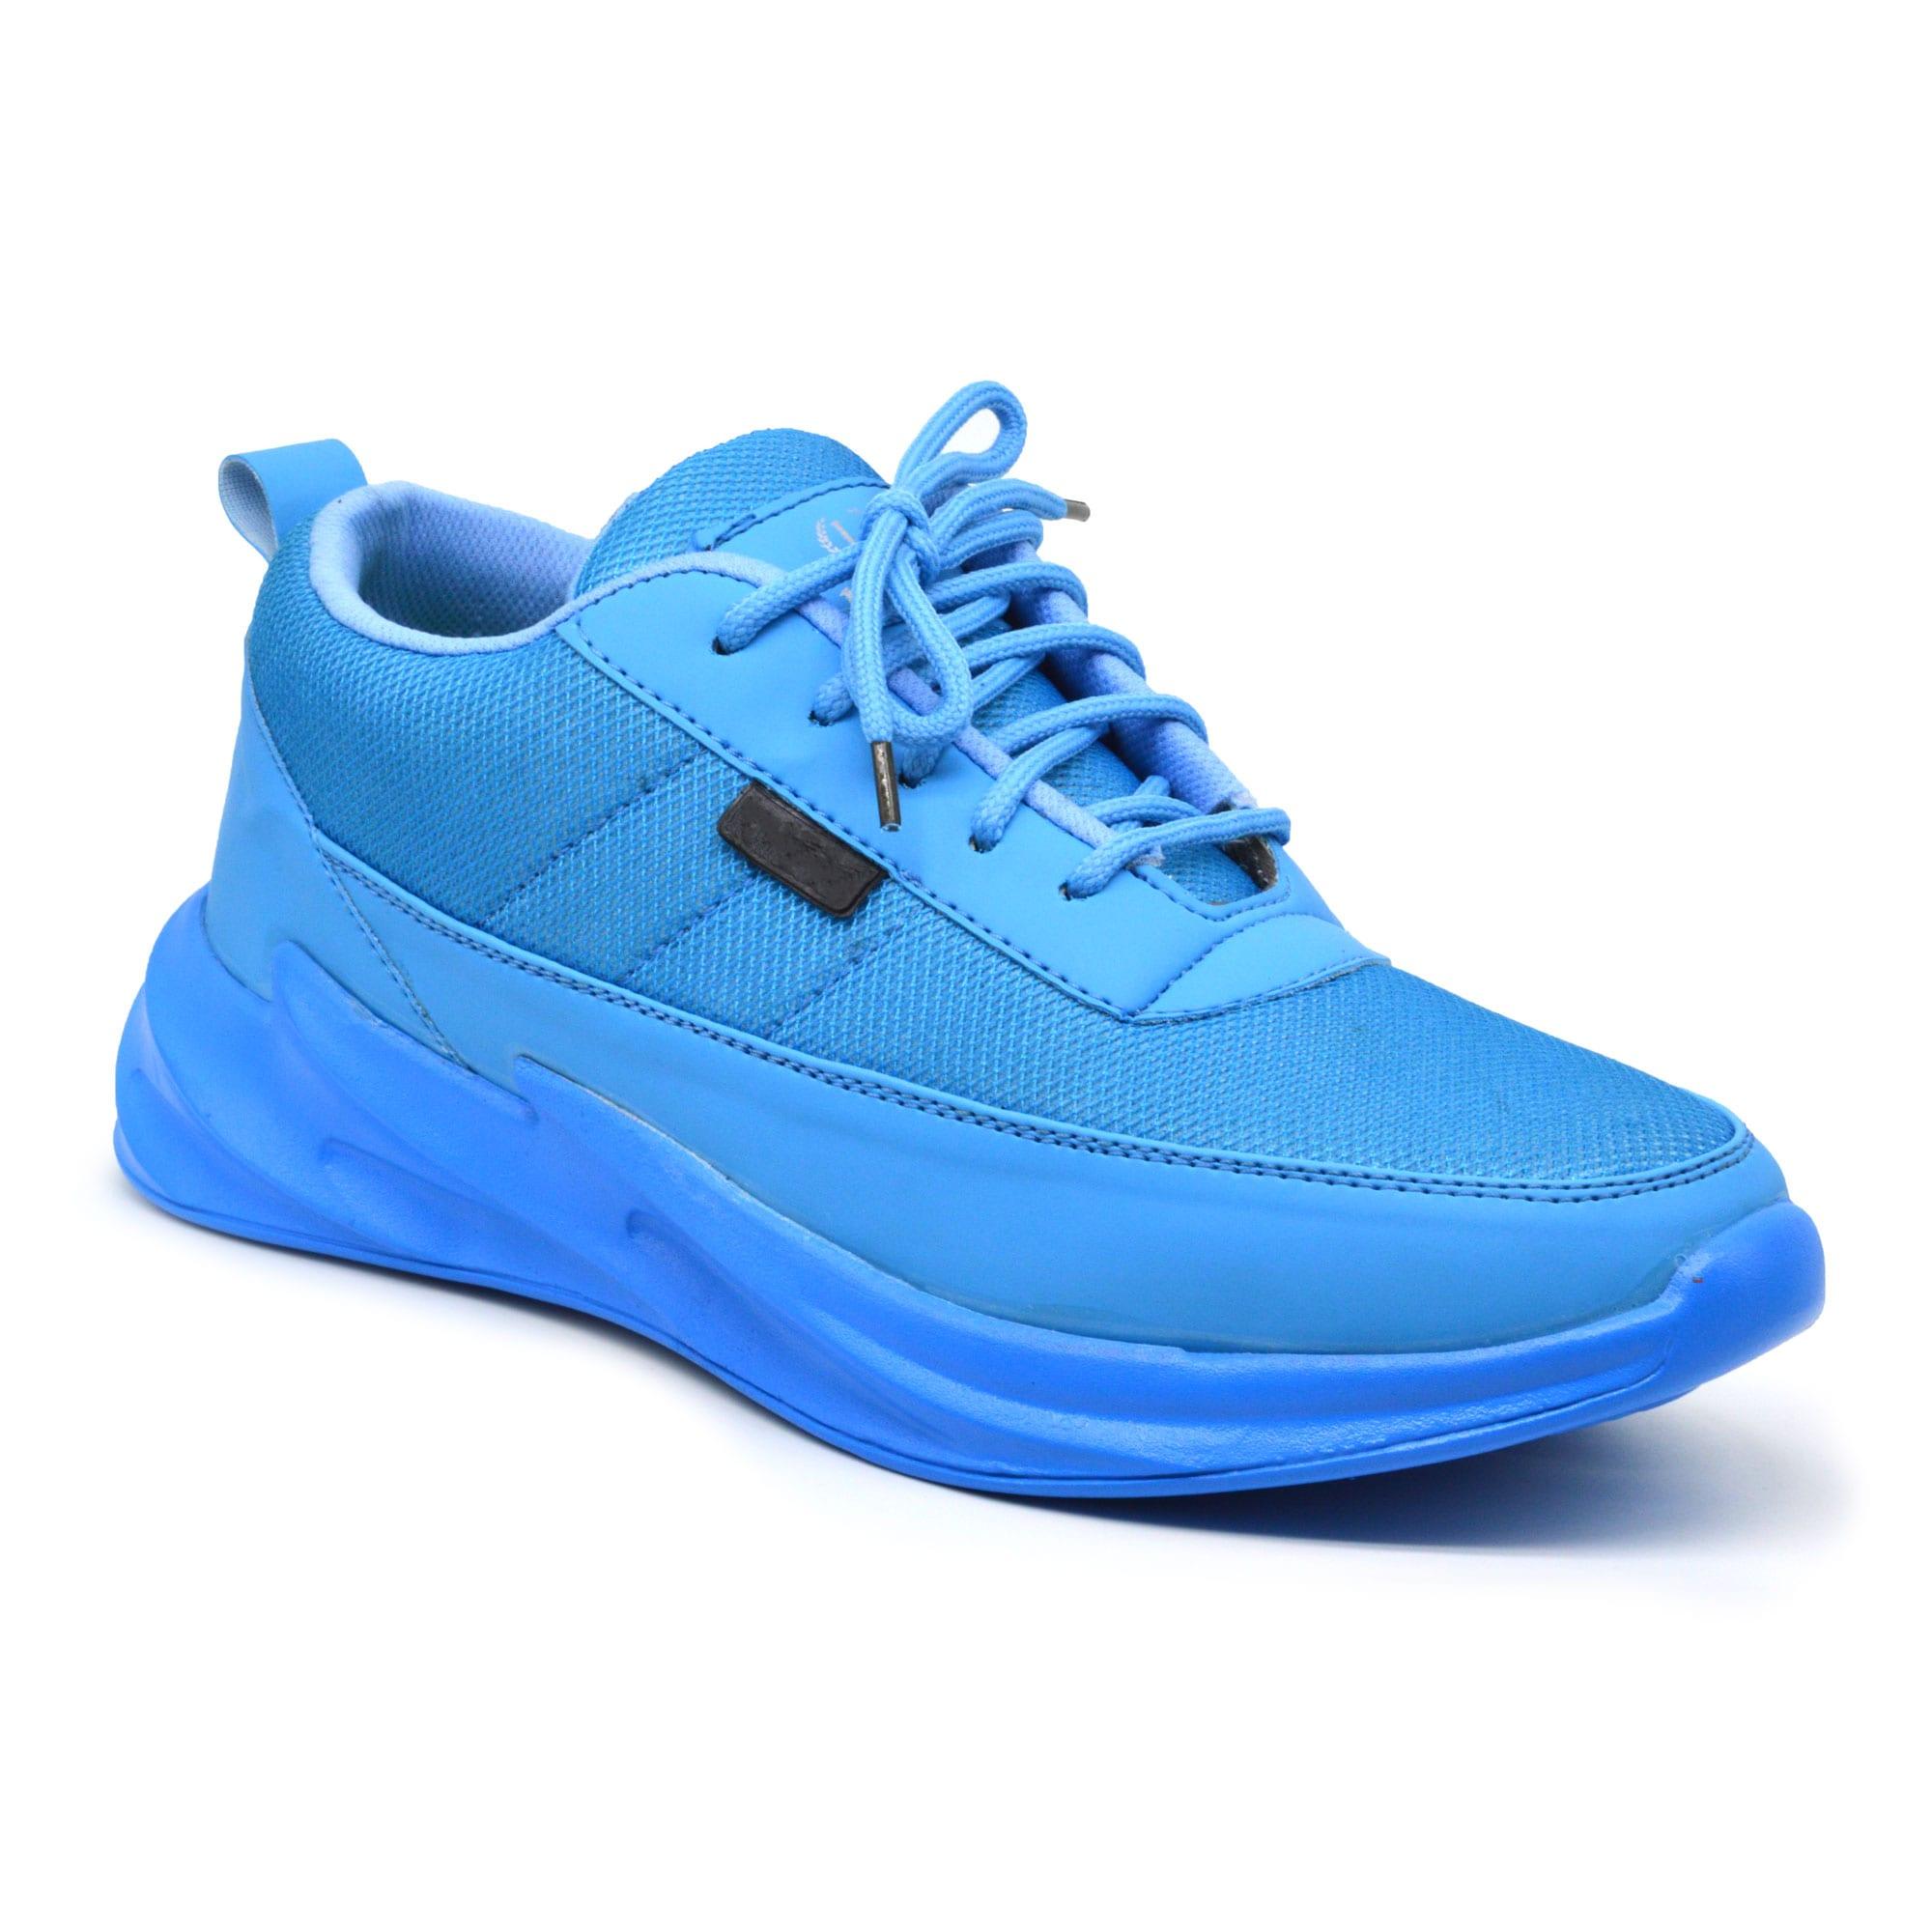 IMCOLUS1.193_SKYBLUE FLEXIBLE &COMFOTABLE MENS Sports Shoes SHOES  IMCOLUS1.193SBLUE (SKYBLUE,6TO10,8 PAIR)